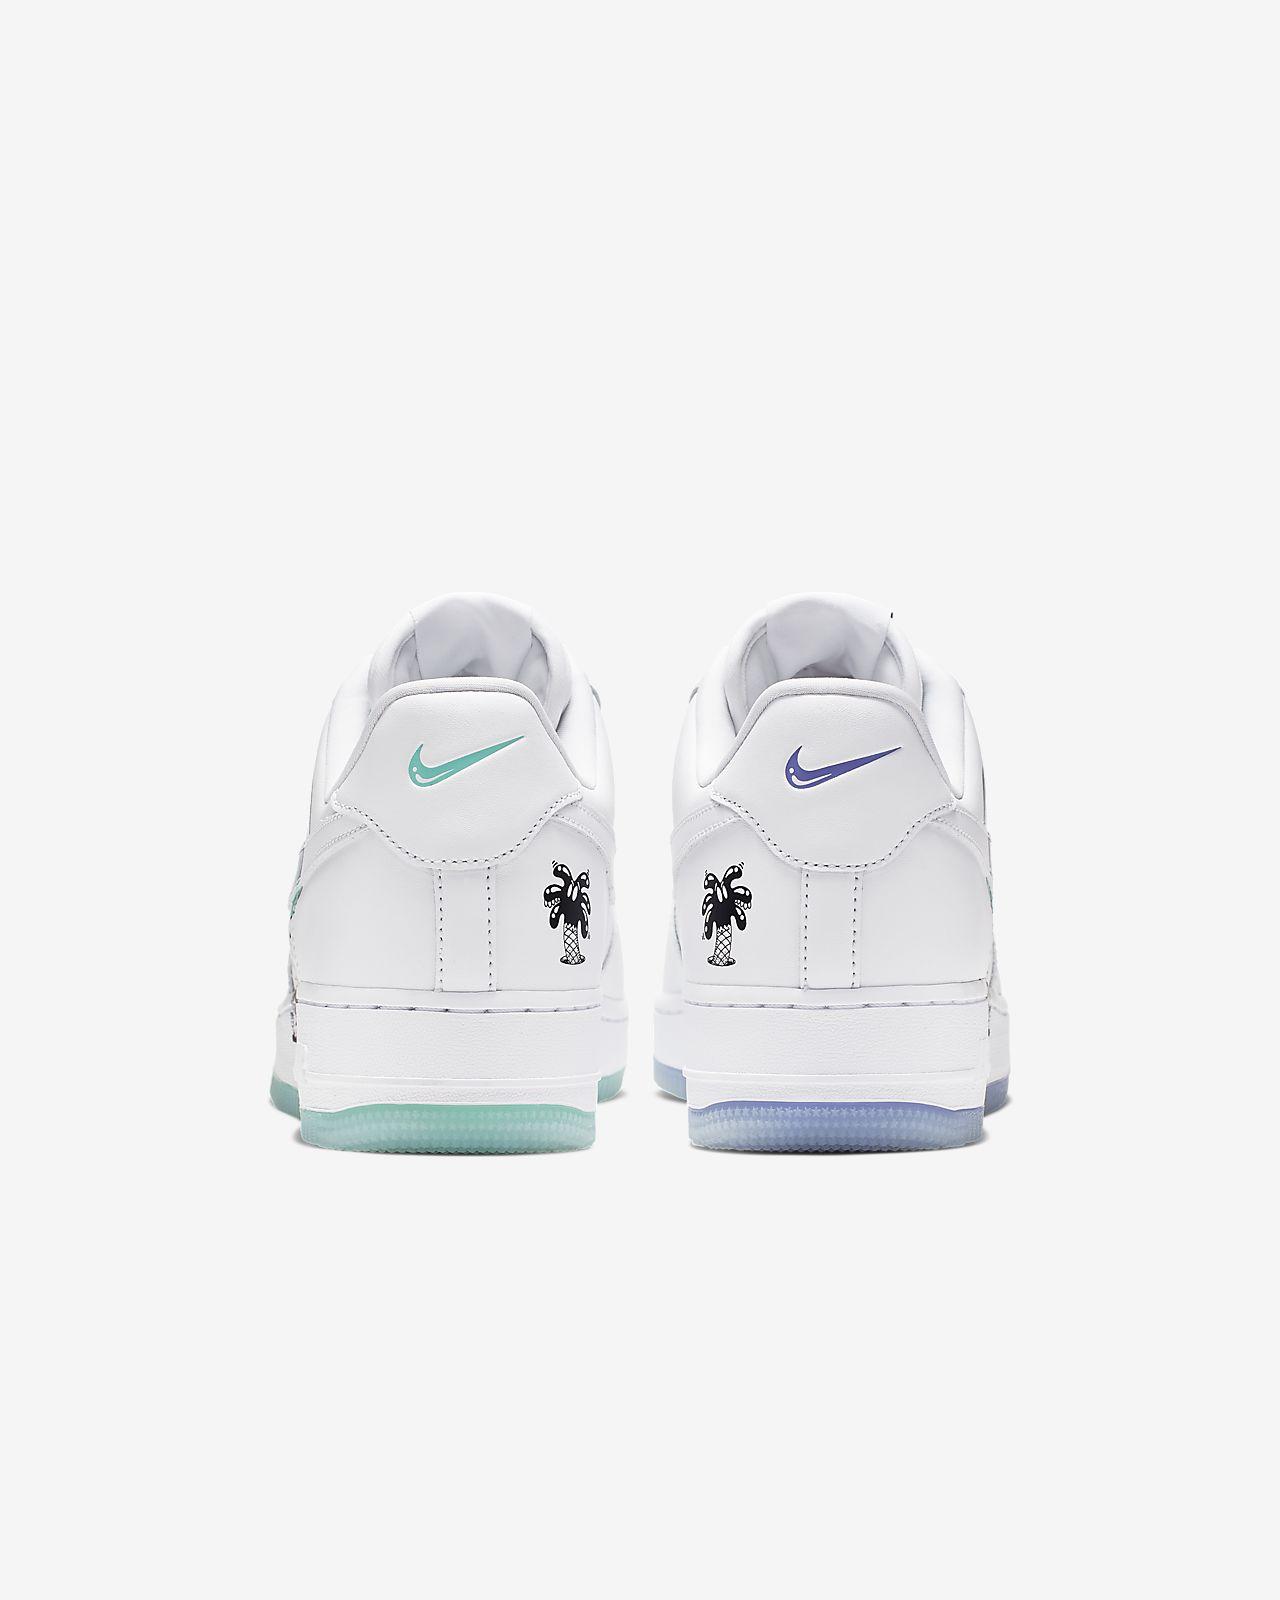 1 Nike Homme Chaussure Flyleather Air D'au Force Pour Composée Qs SzVGqMpU